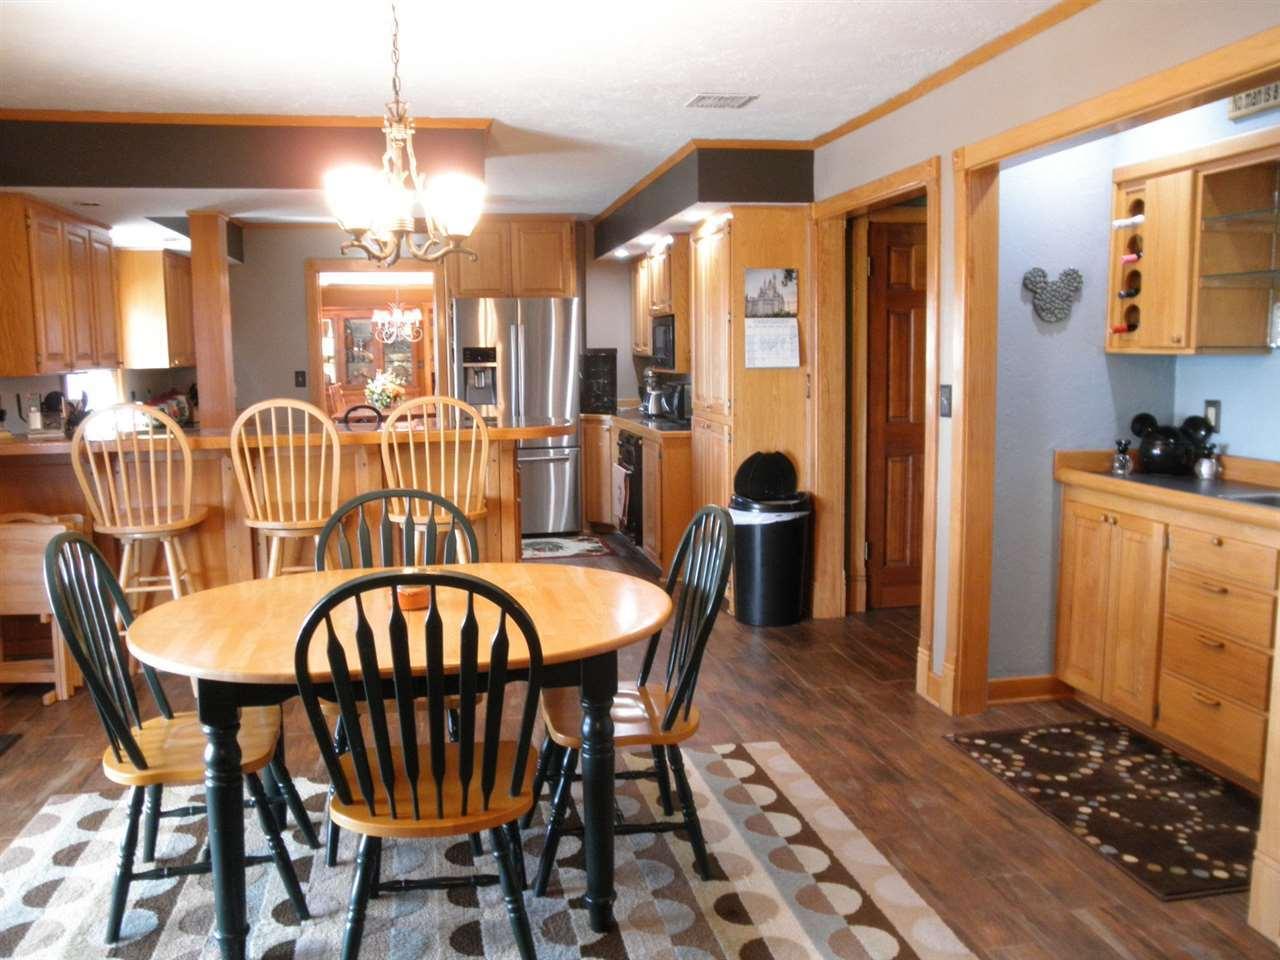 Sold Intraoffice W/MLS | 7038 River Ridge Drive  Ponca City, OK 74604 8